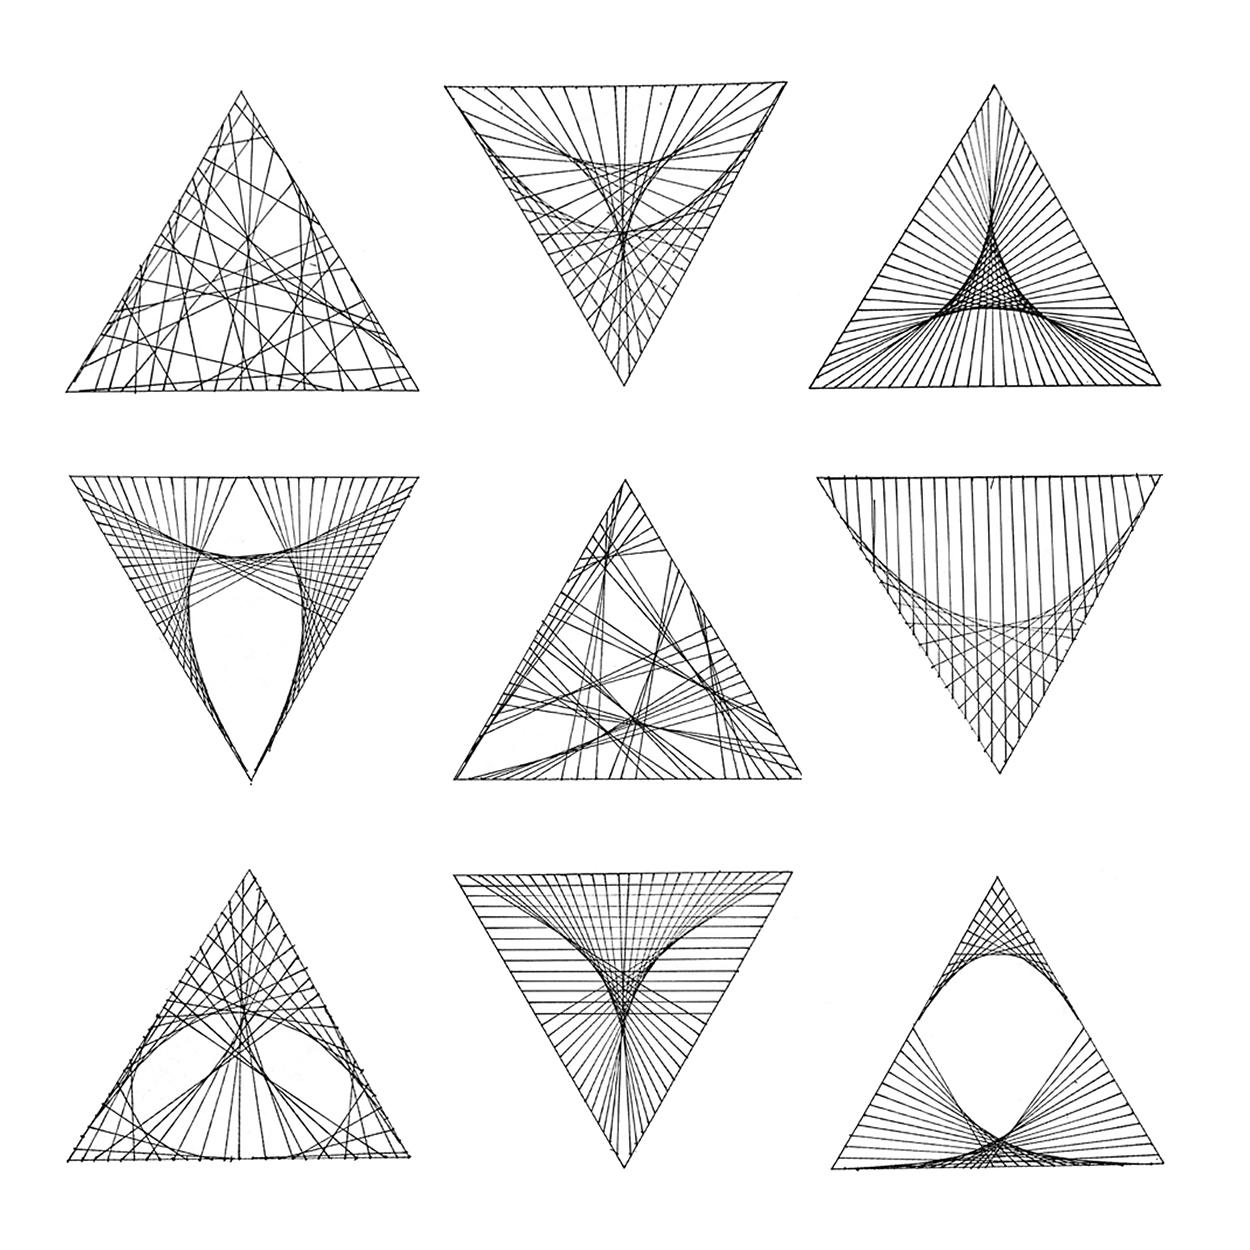 weaving_patterns, © 'Halo Sukkah' team